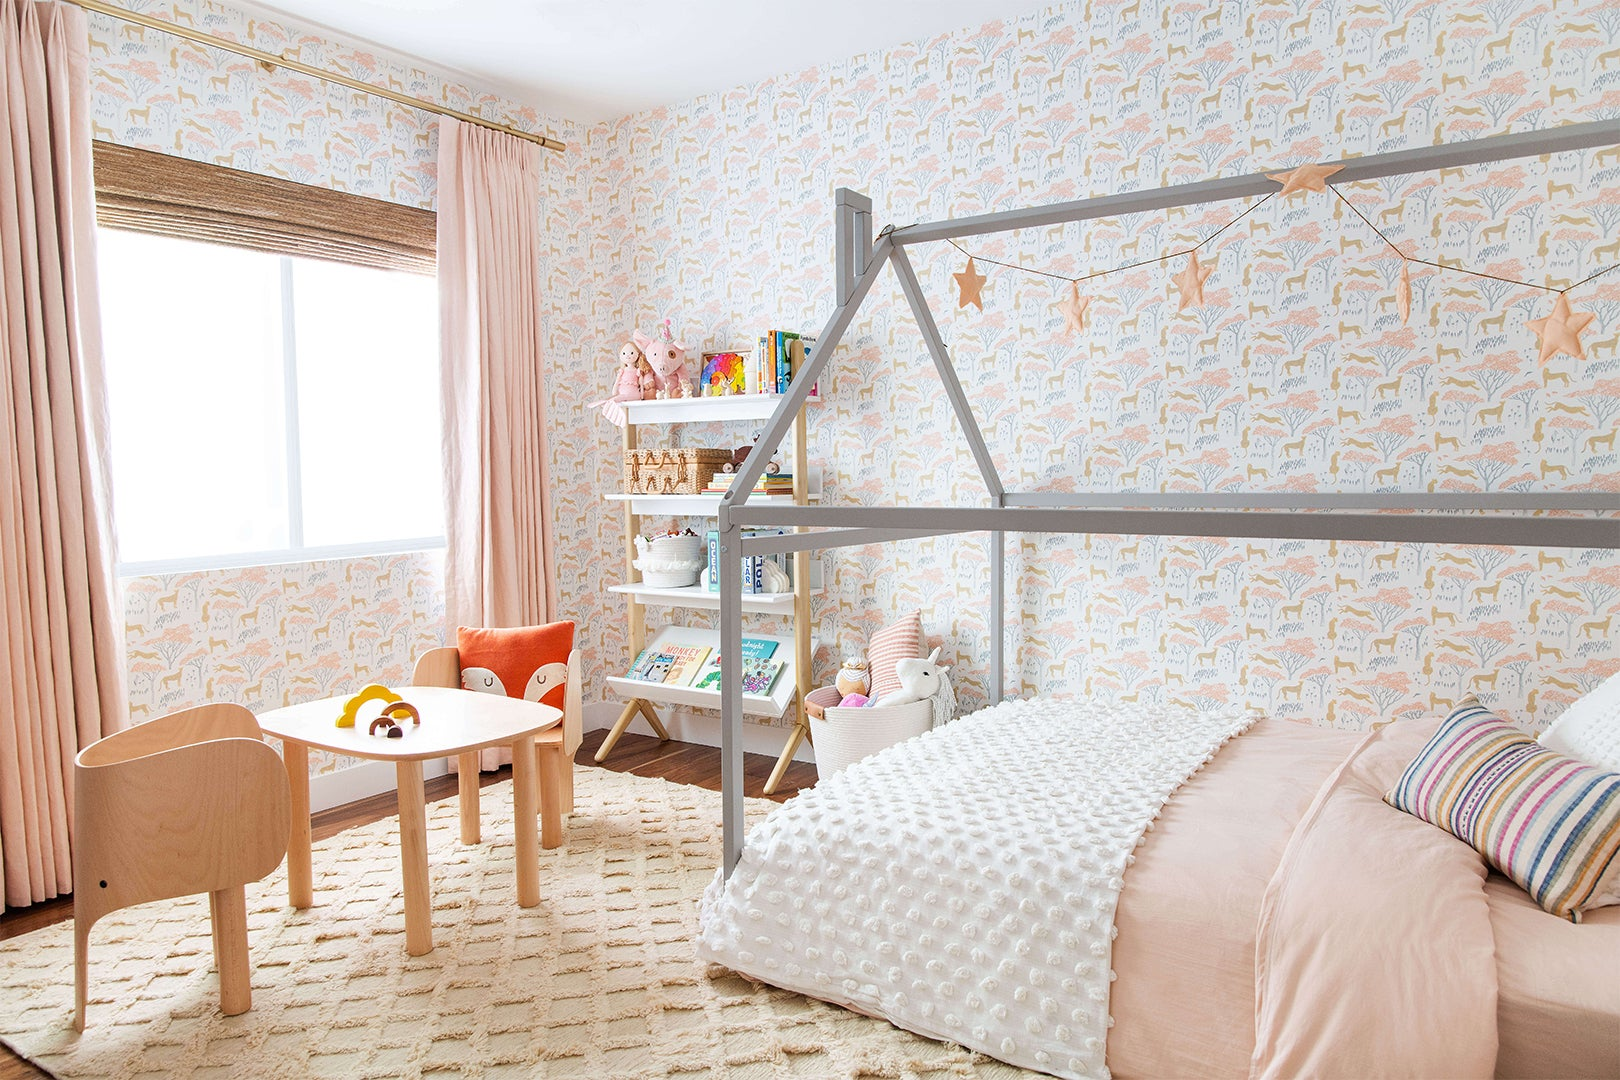 00-FEATURE-kids-room-wallpaper-renovation-domino